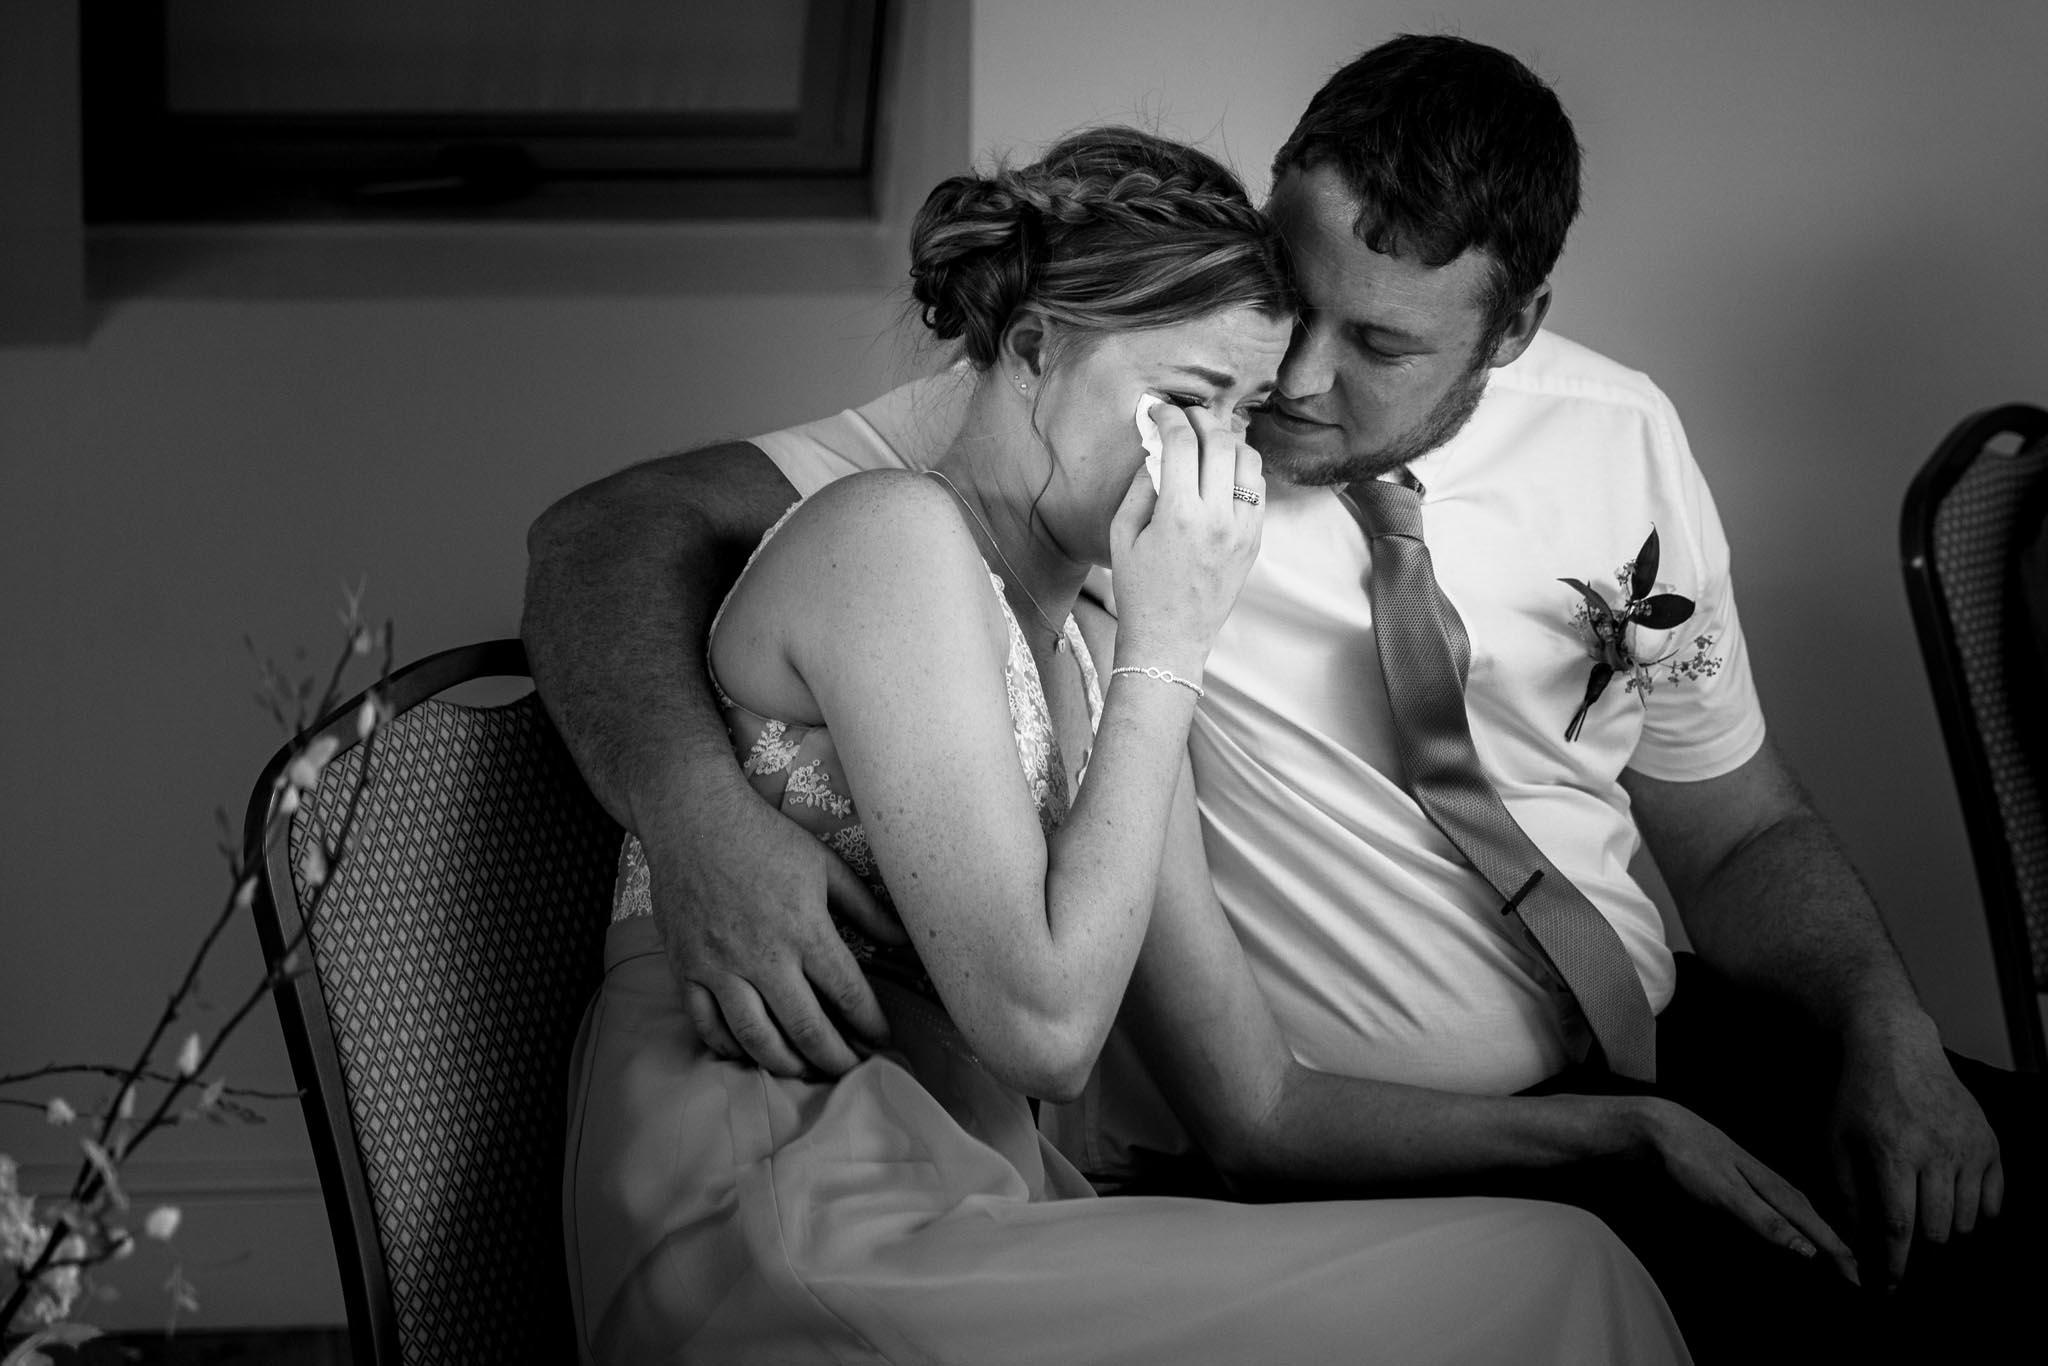 432-Ceremony-Luke-Yasmin-The-Rayleigh-Club-Wedding-Photography.jpg